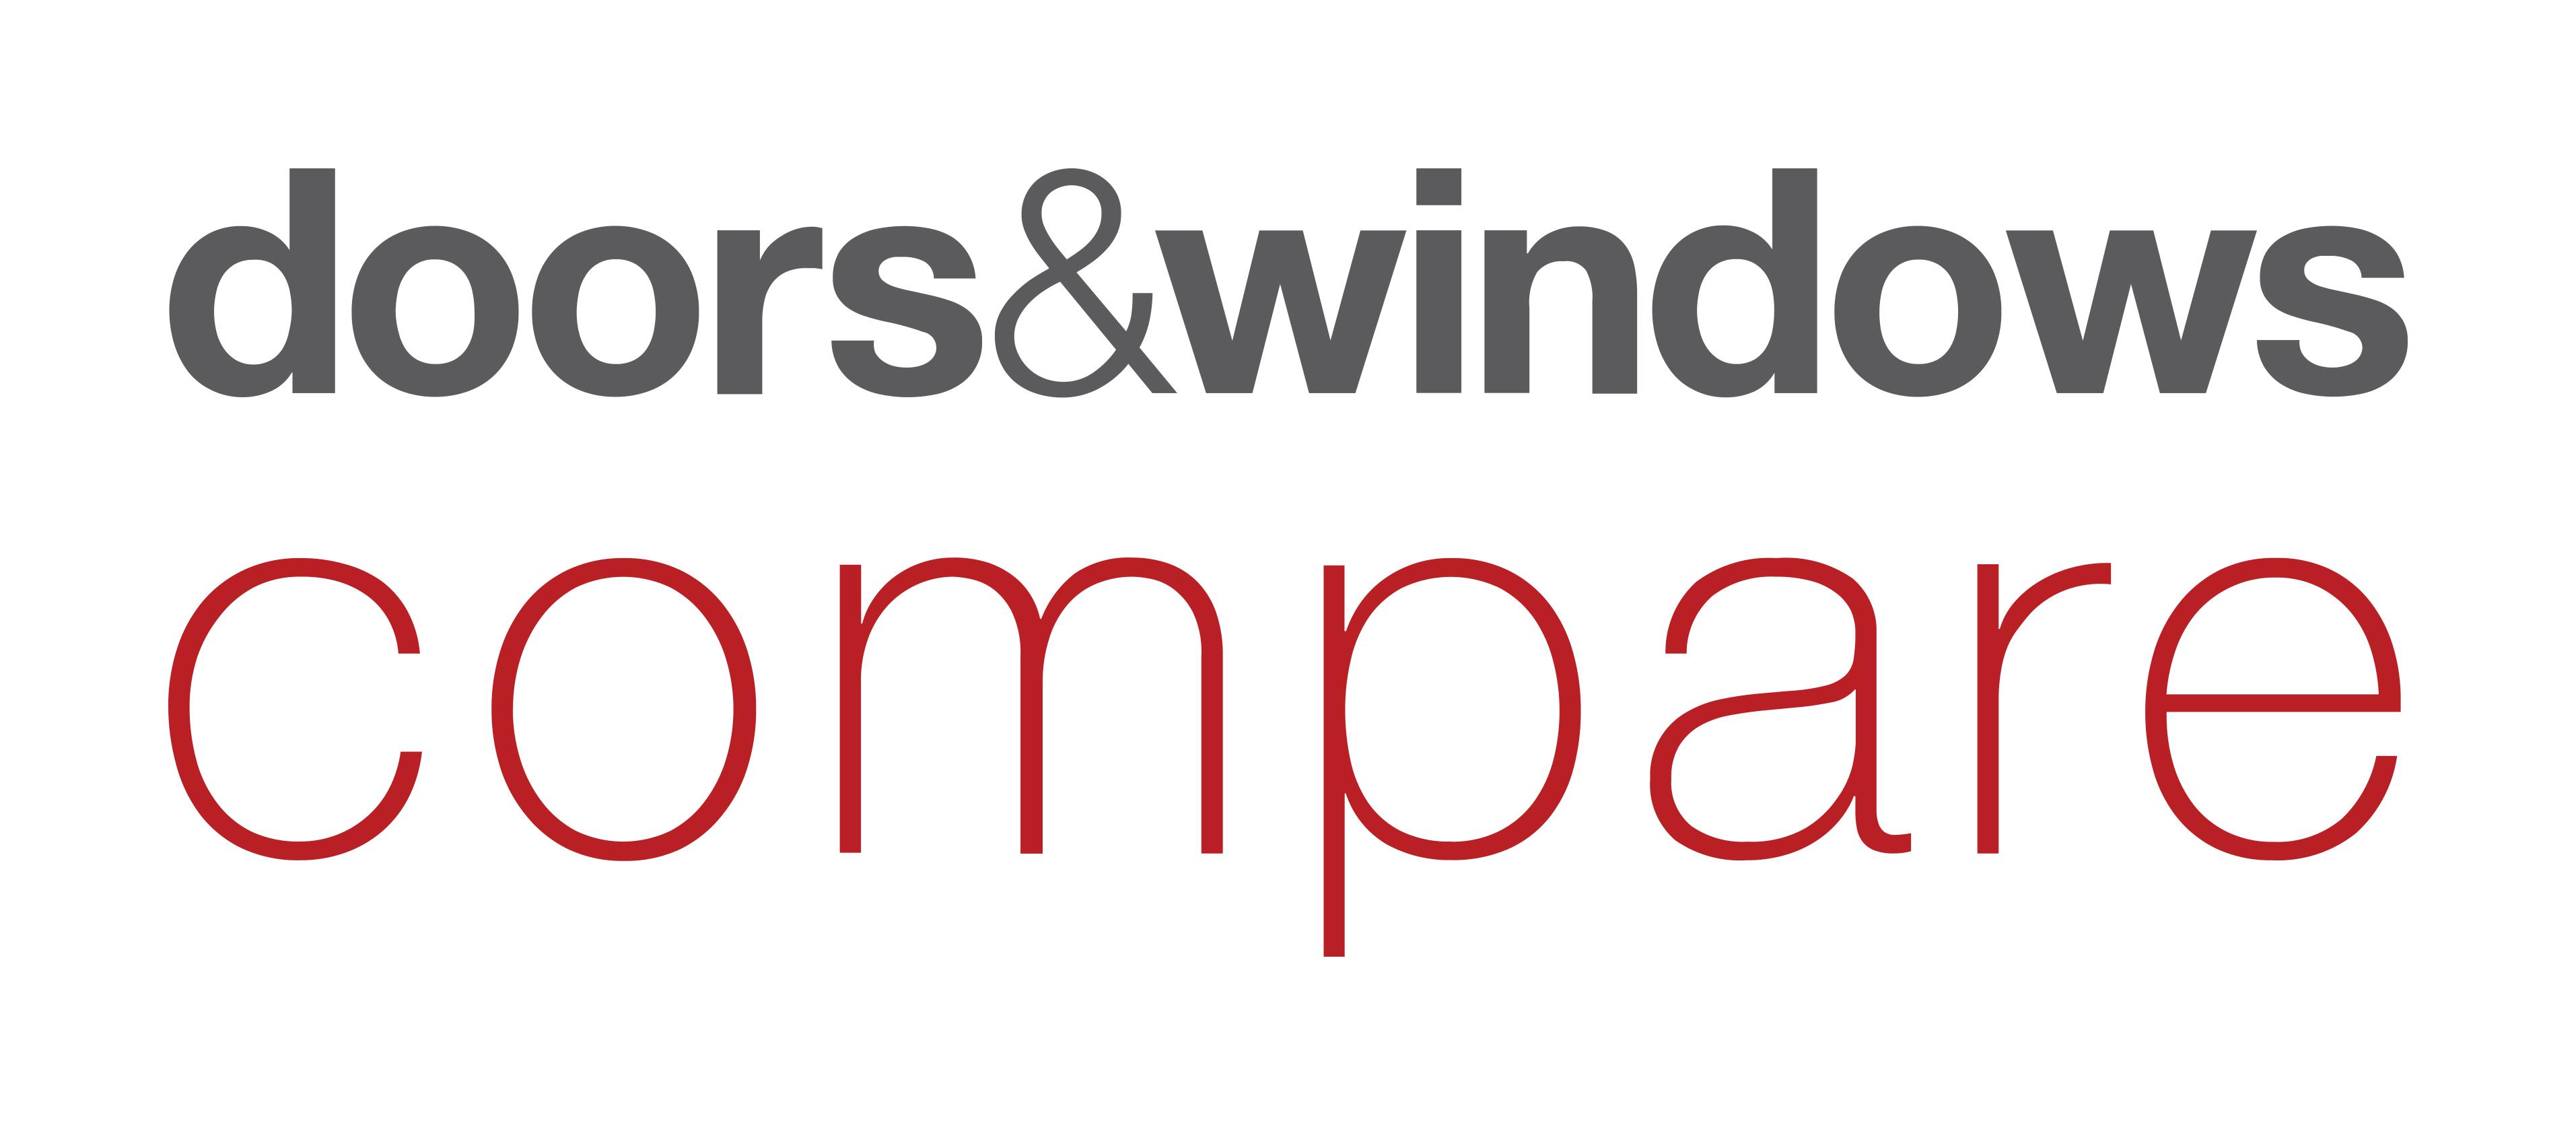 Doors & Windows Compare (cmyk)